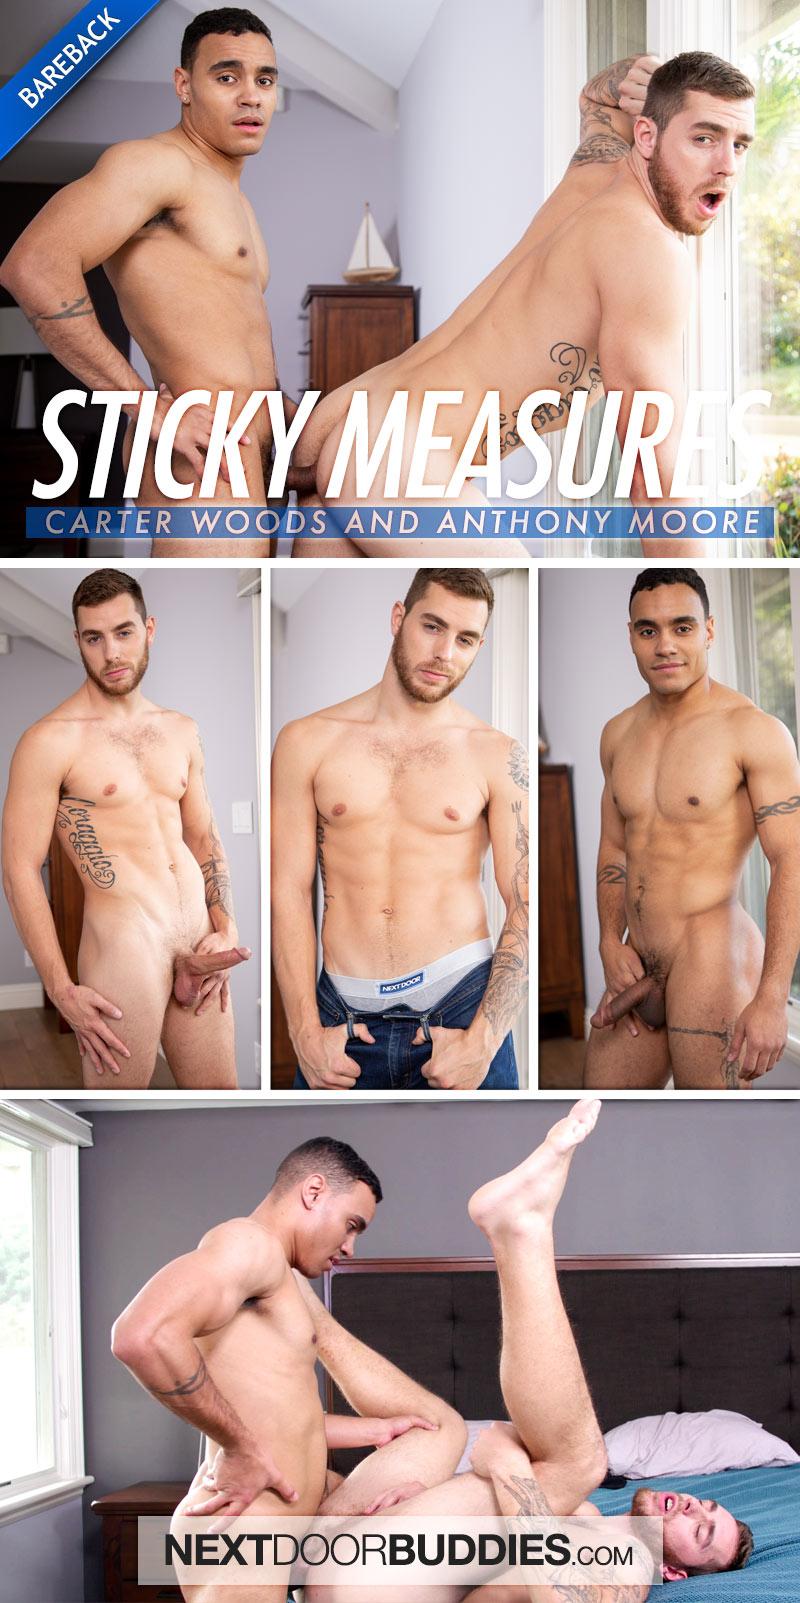 Sticky Measures (Anthony Moore Fucks Carter Woods) (Bareback) at Next Door Buddies